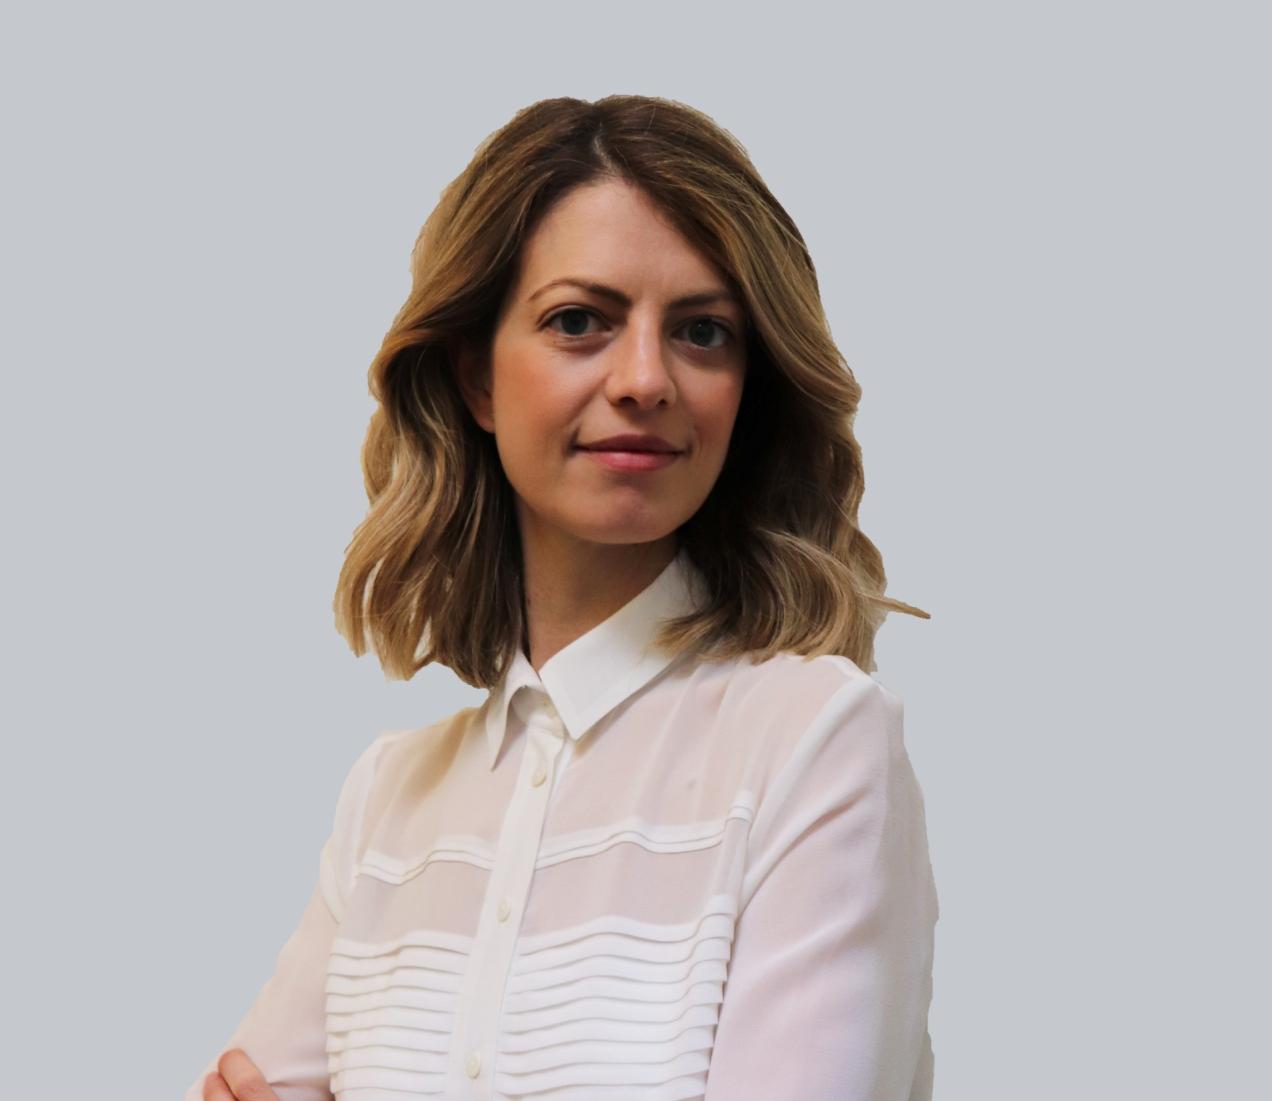 Paola Tumbarello